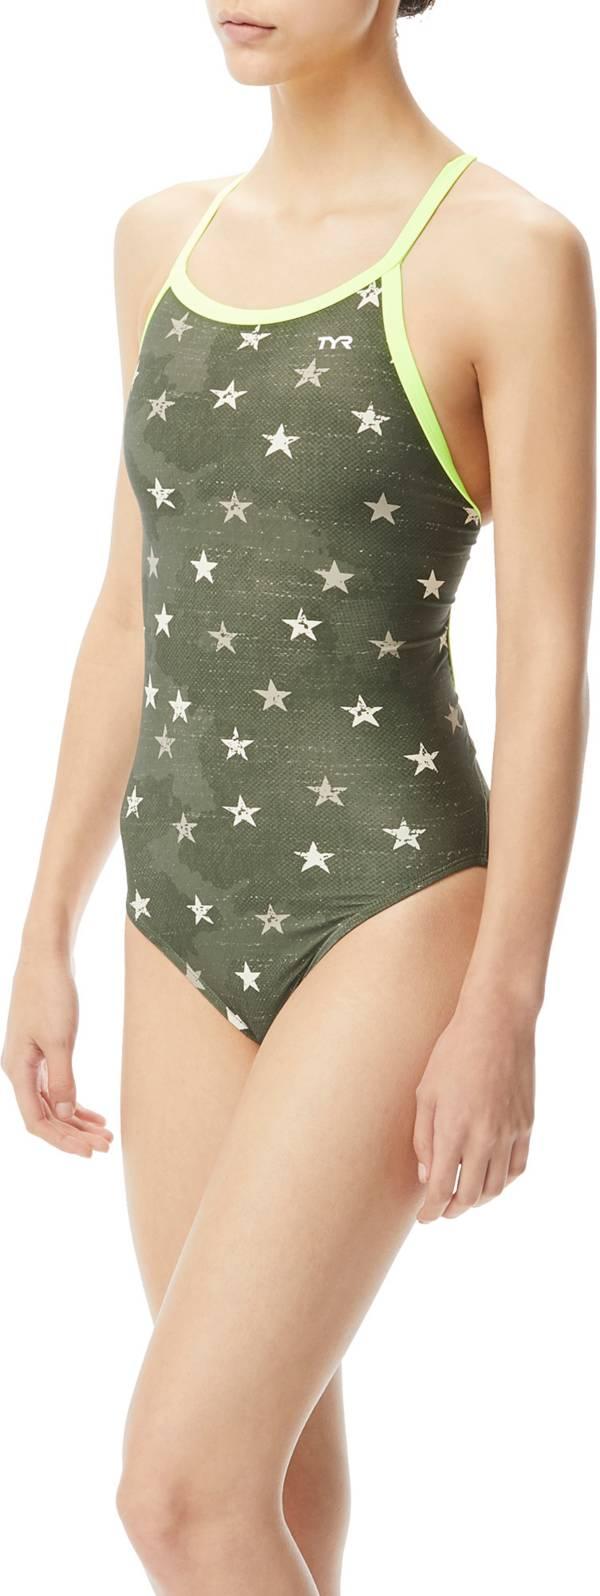 TYR Women's Stargazed Diamondfit One Piece Swimsuit product image